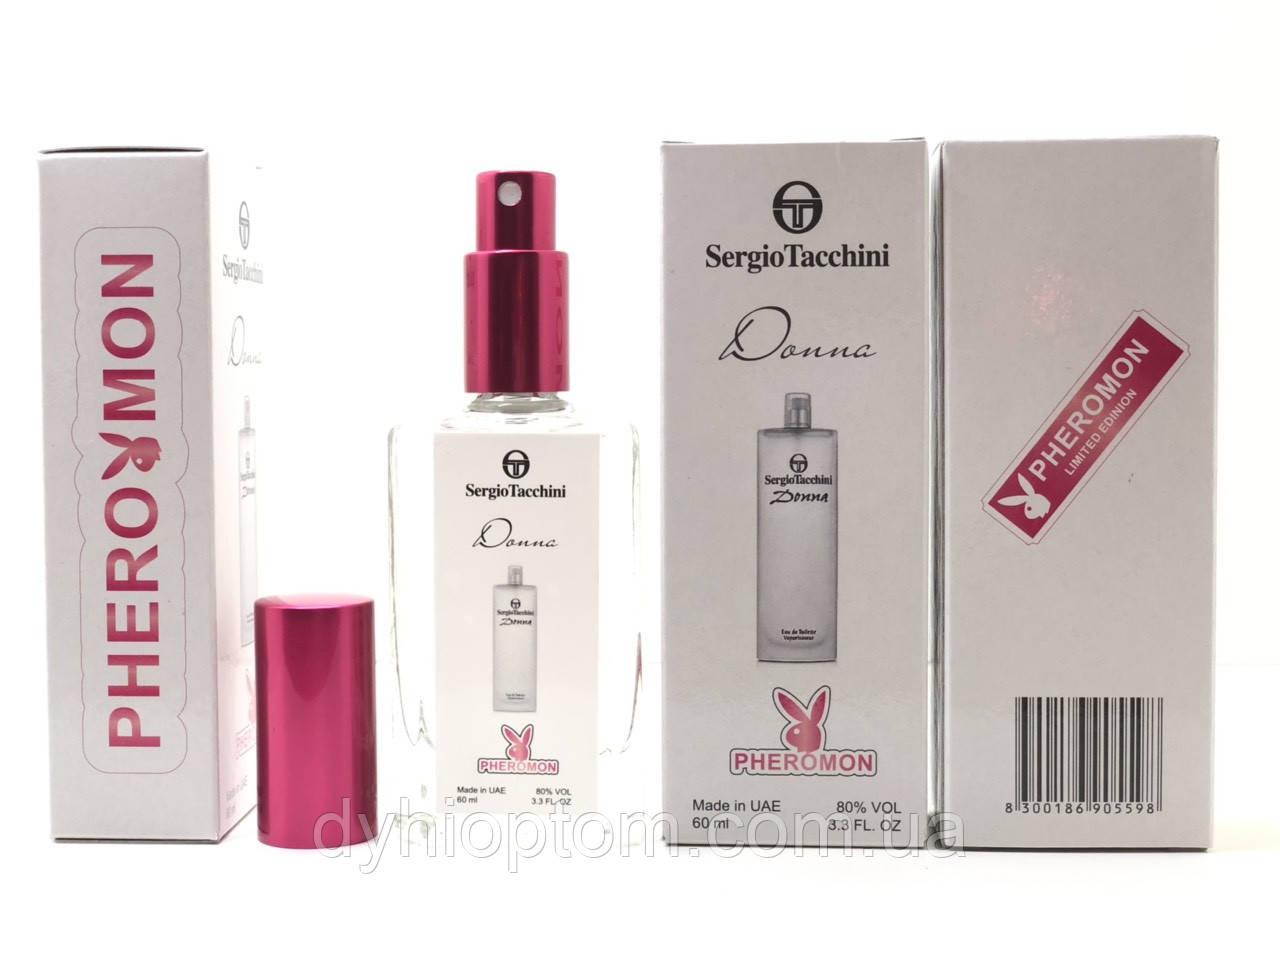 Женский парфюм Sergio Tacchini Donna, 60 ml